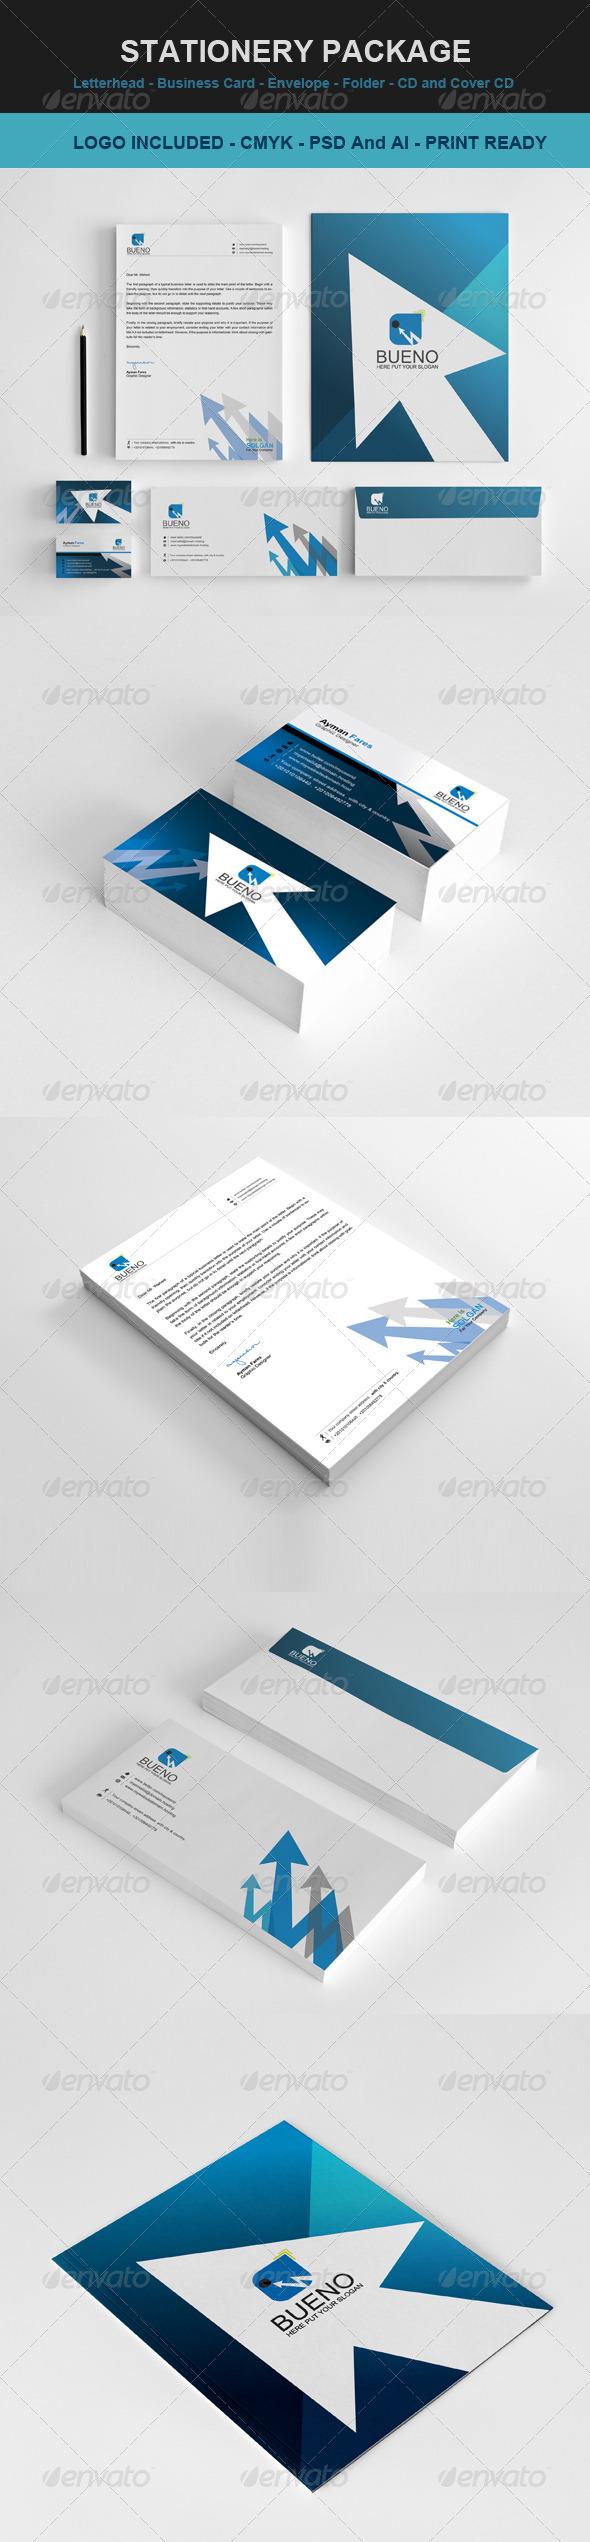 GraphicRiver Stationary & Identity Bueno 3545824